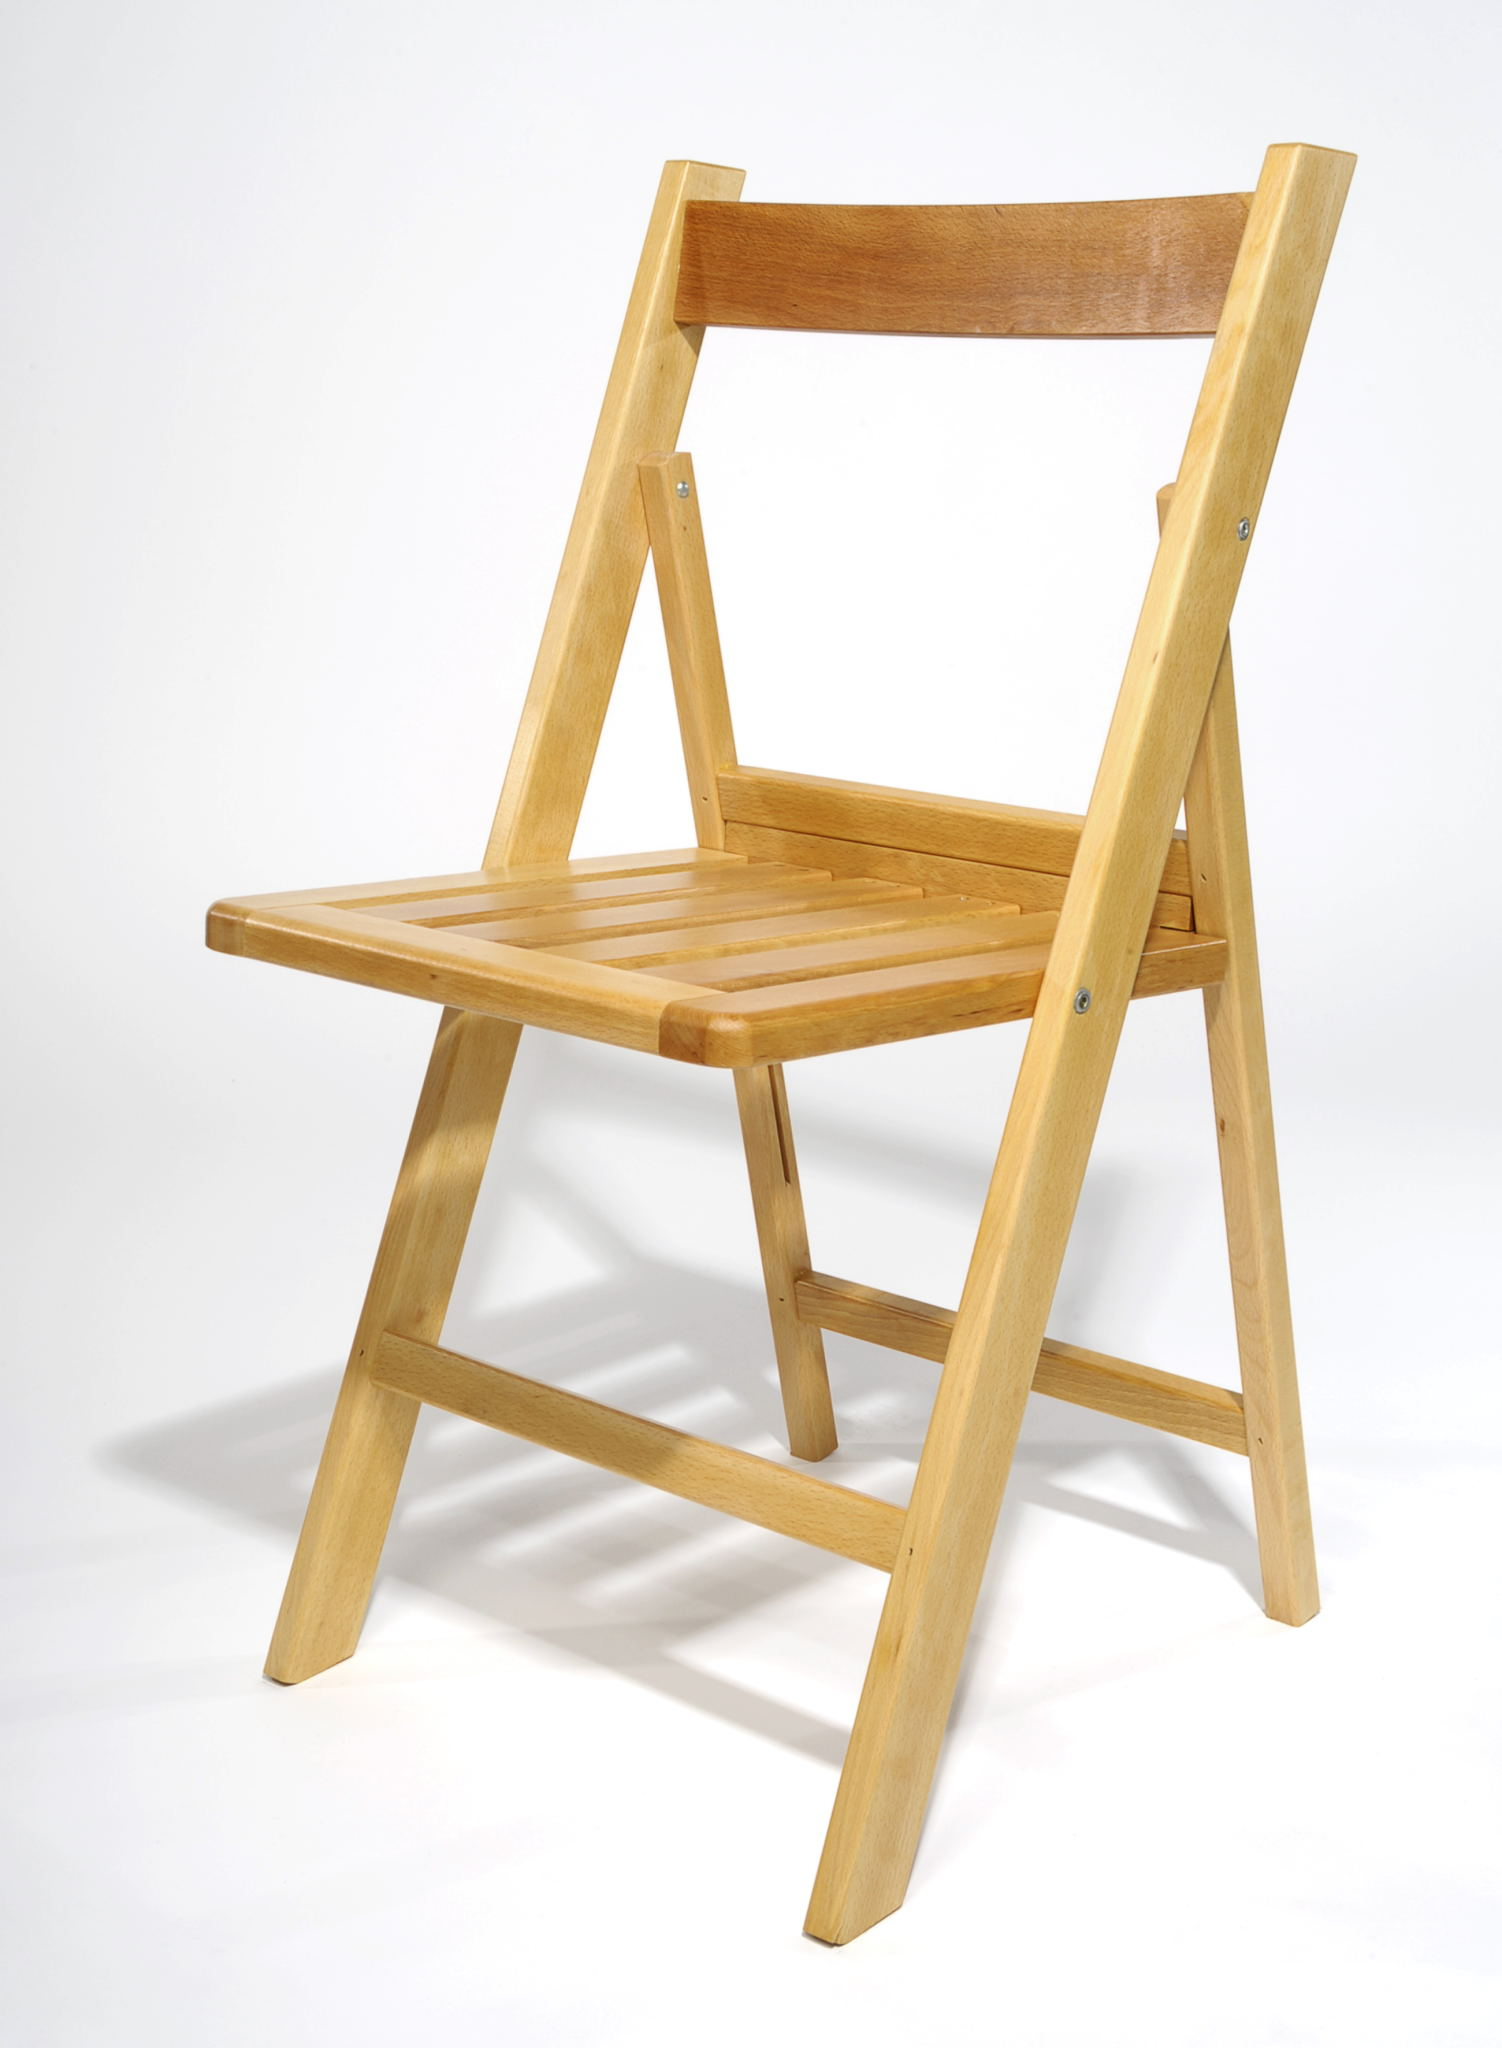 Silla plegable bilbao de madera certificada garc a hermanos - Sillas de madera plegables ...